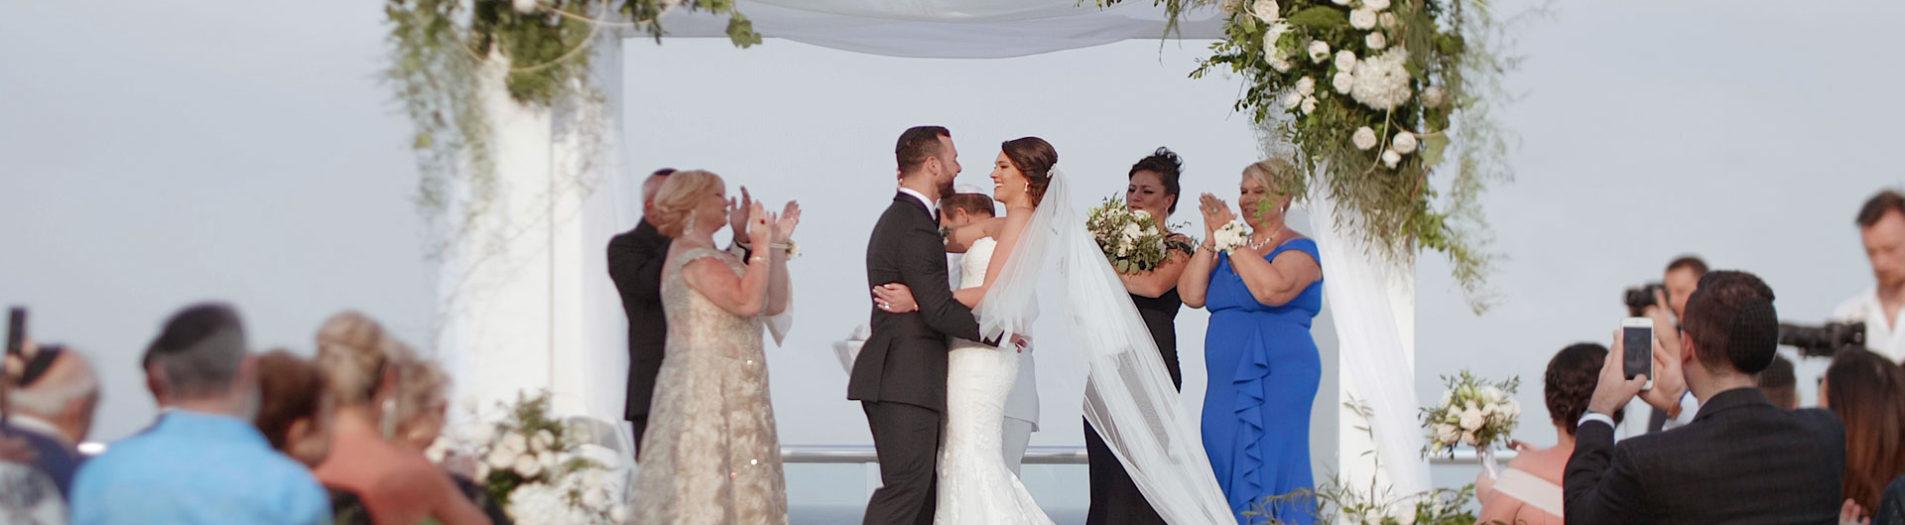 wedding in budget